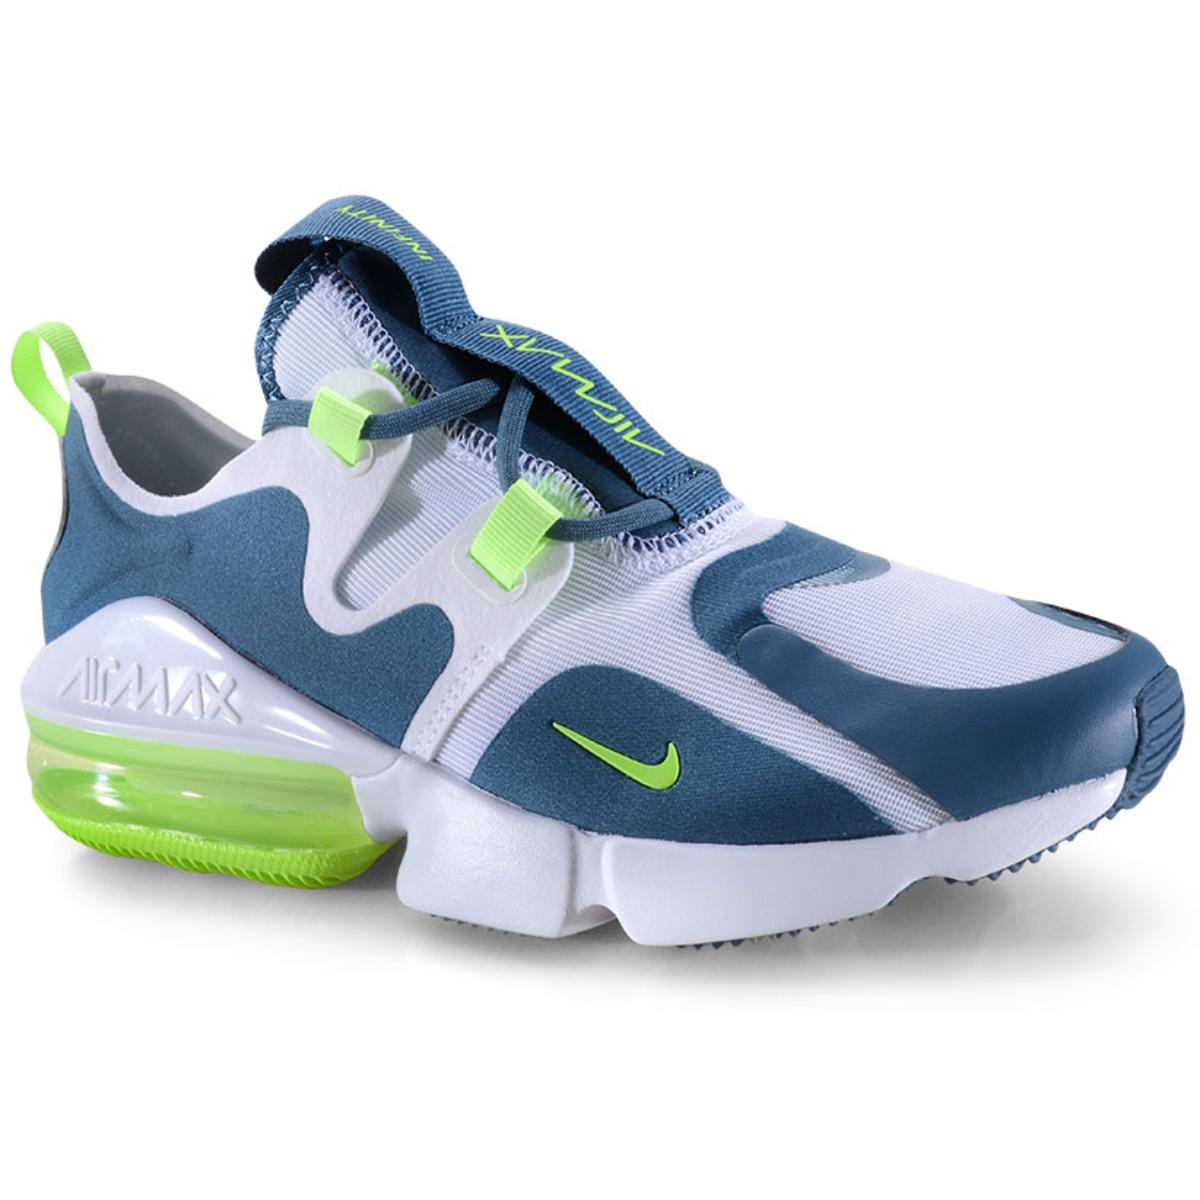 Tênis Masculino Nike Bq3999-104 Air Max Infinity Branco/azul/limão